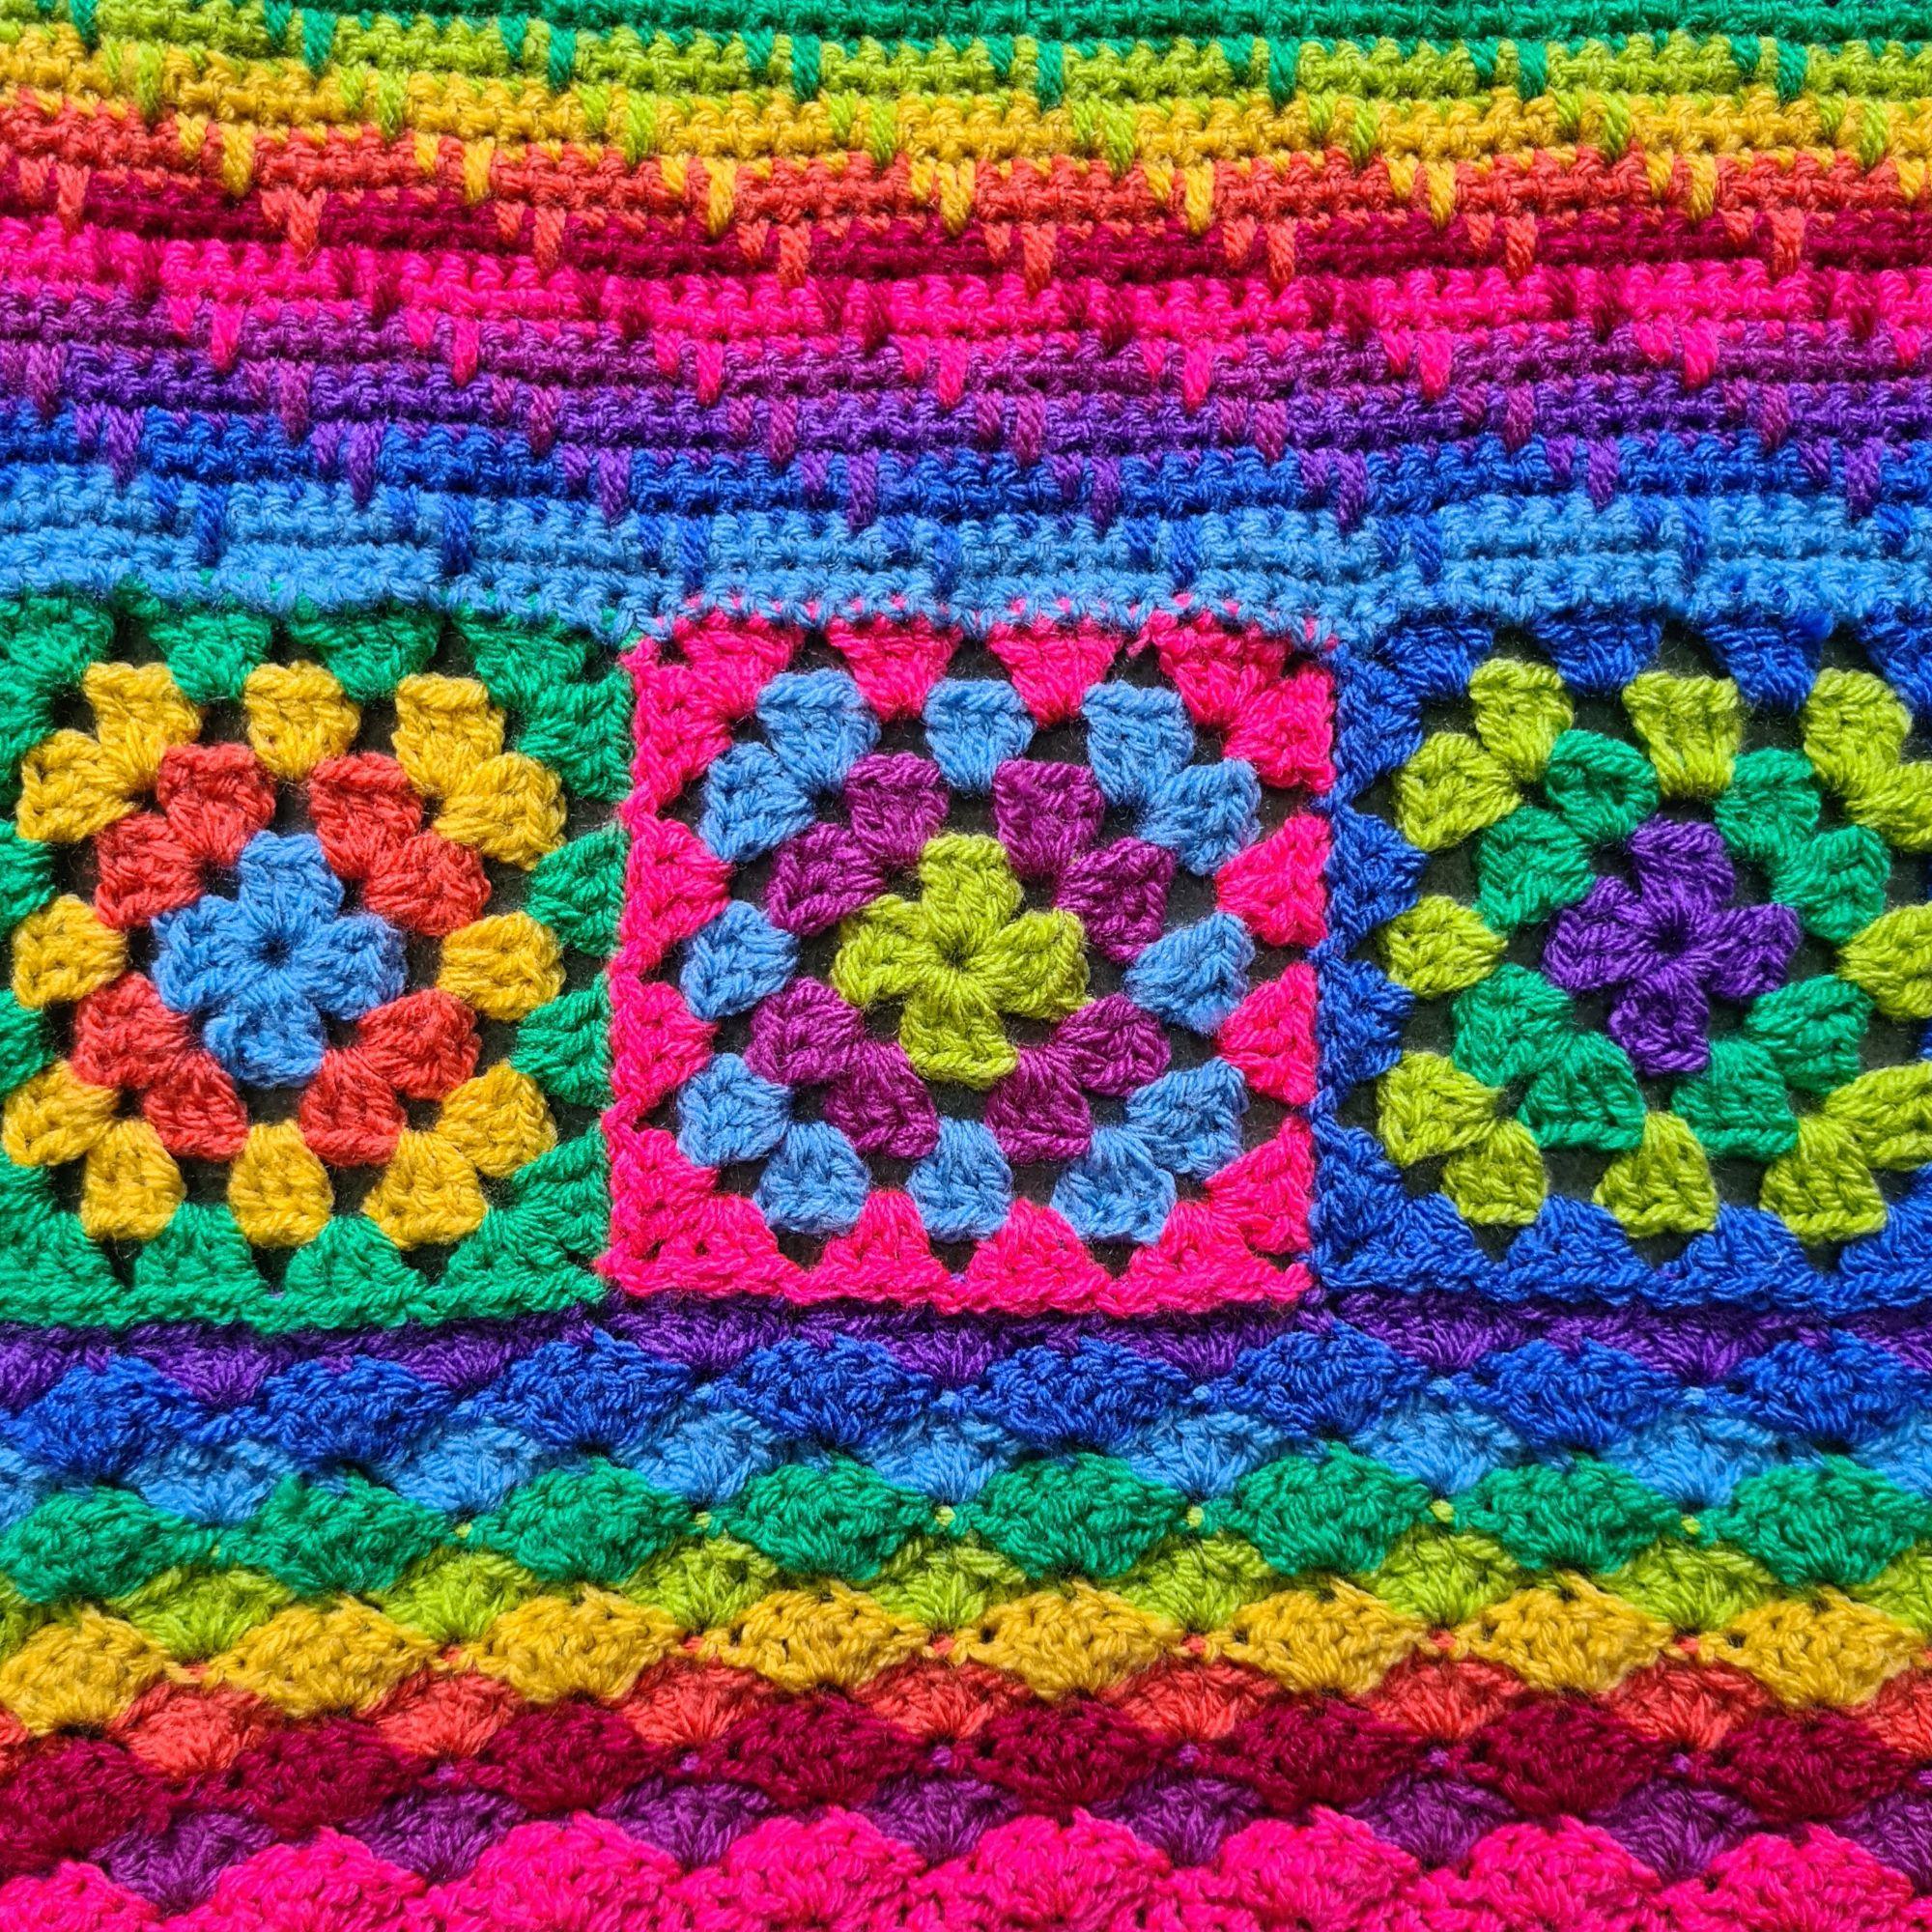 Diana Bensted - Crochet masterclass 1-shells - 2 granny - 3 Spike